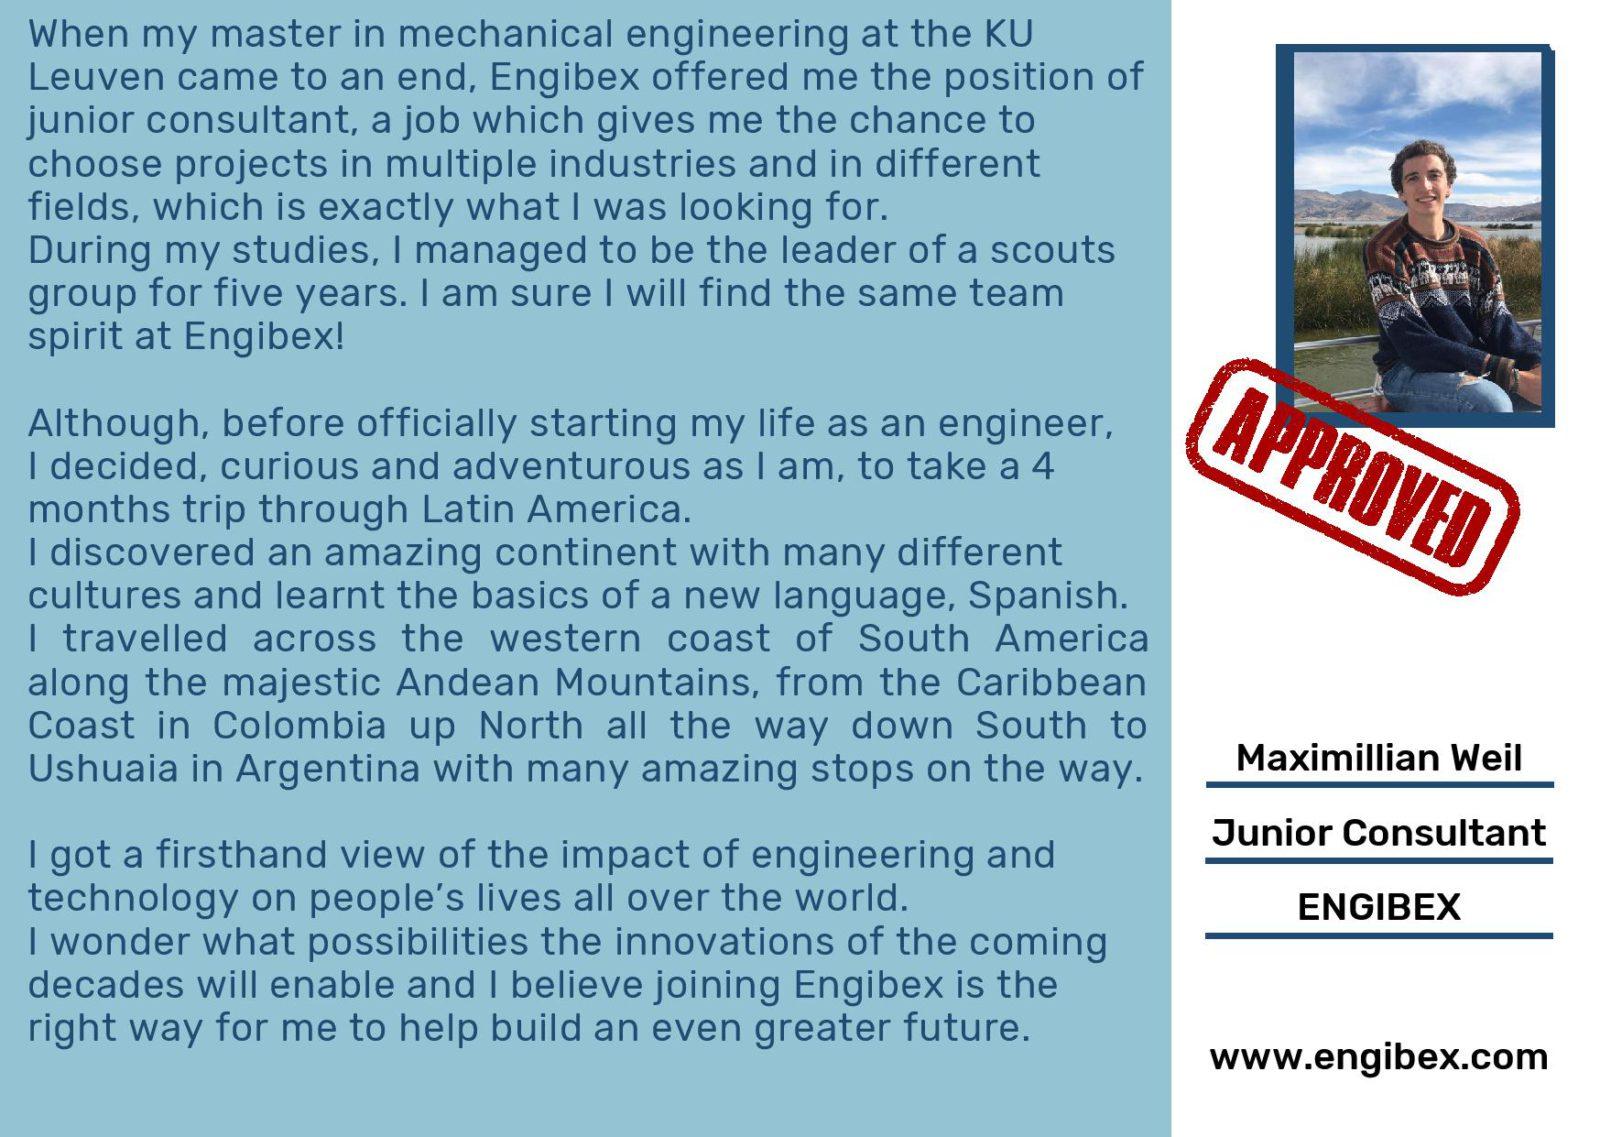 Engibex Consultant - Maximillian Weil